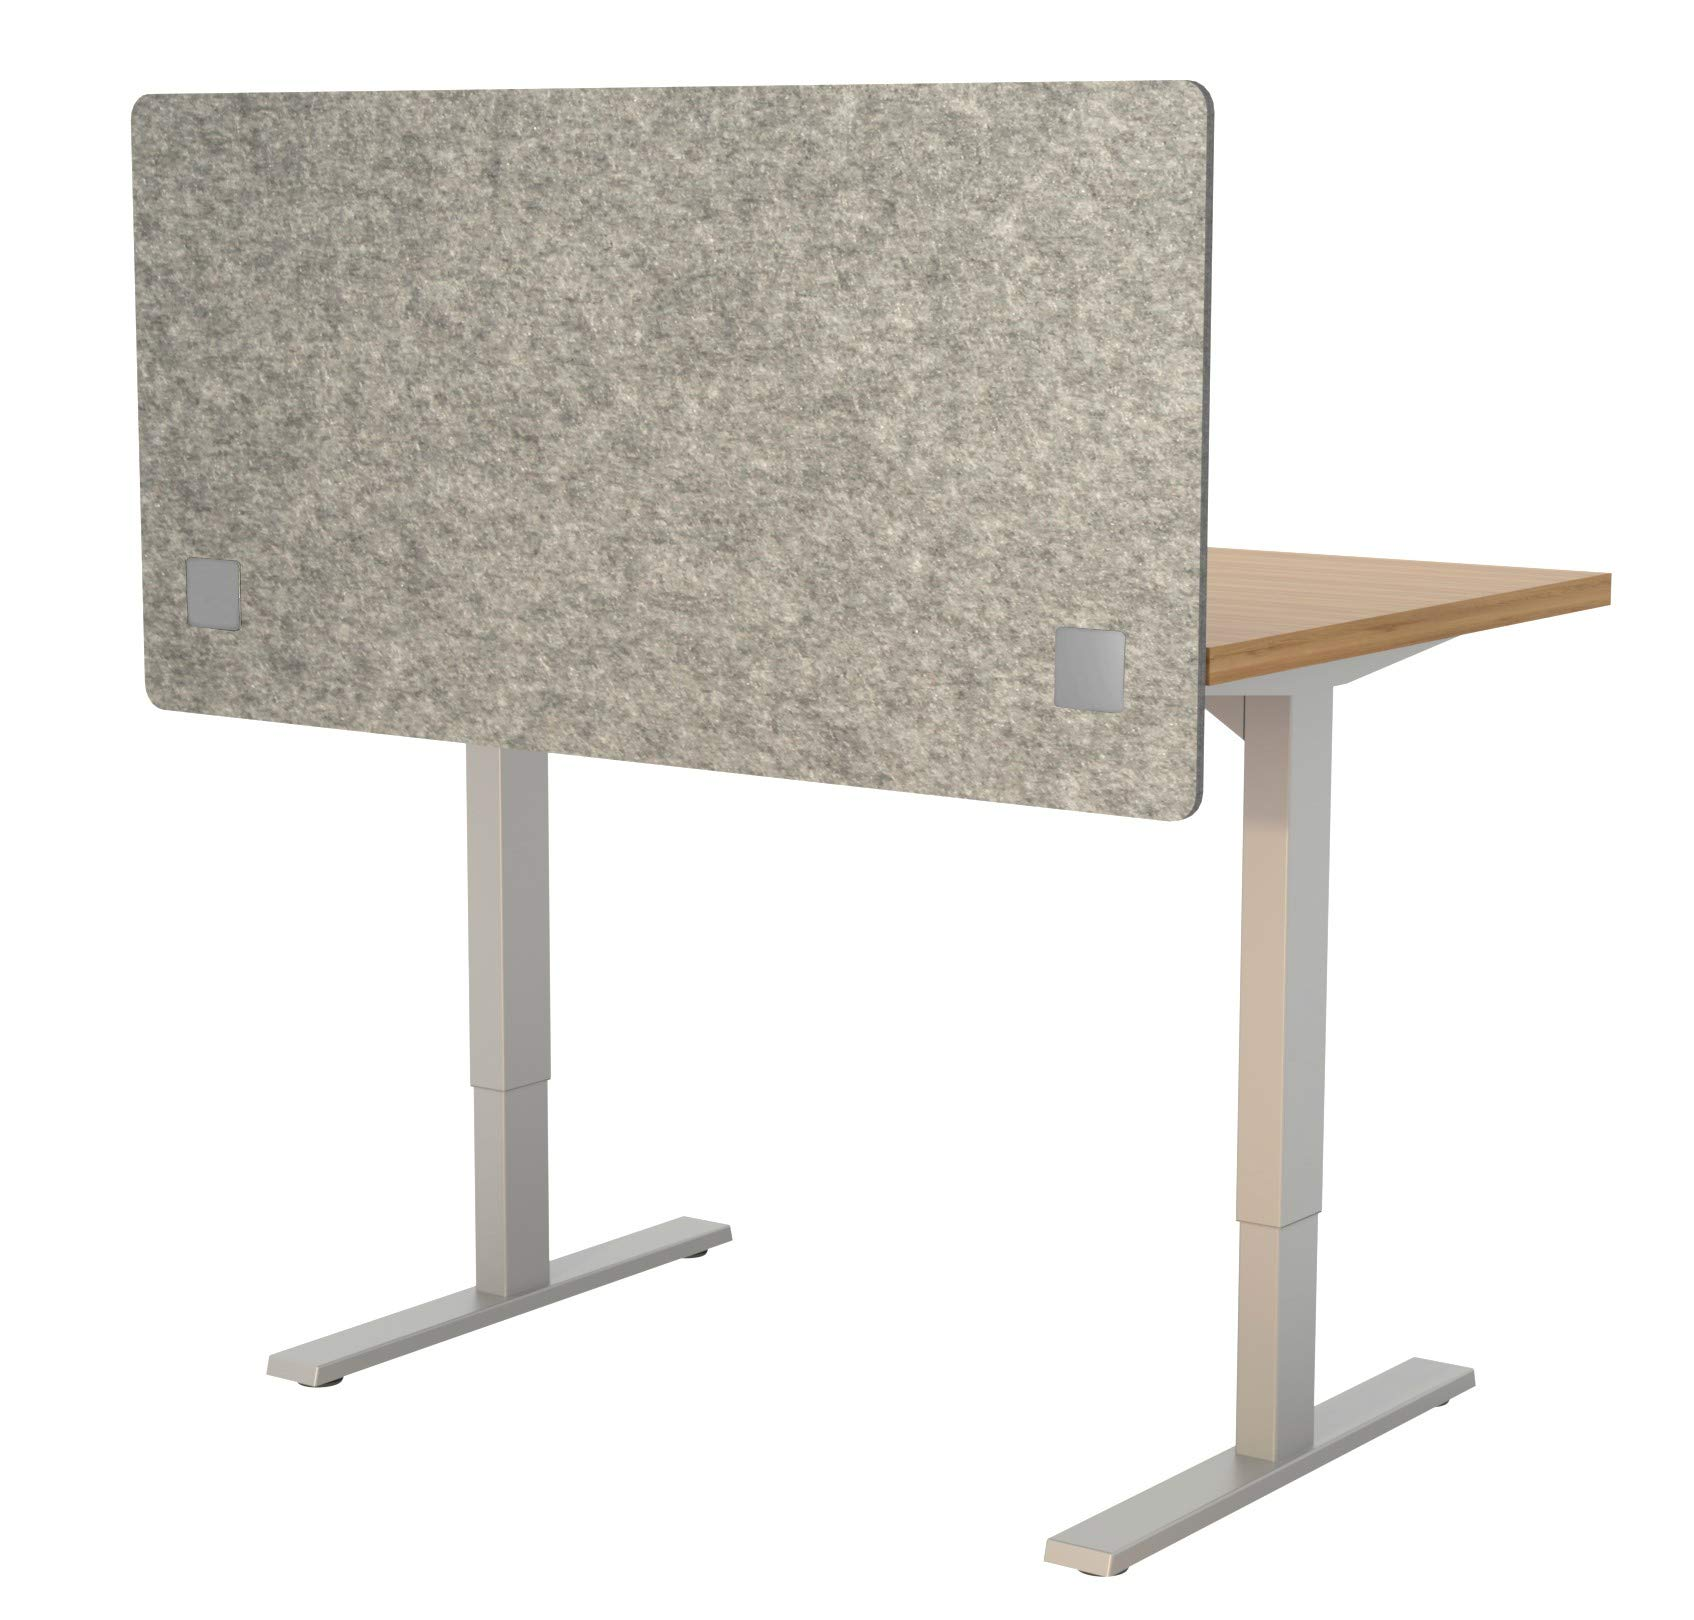 "VaRoom Acoustic Partition, Sound Absorbing Desk Divider – 48"" W x 24""H Privacy Desk Mounted Cubicle Panel, Ash Grey"